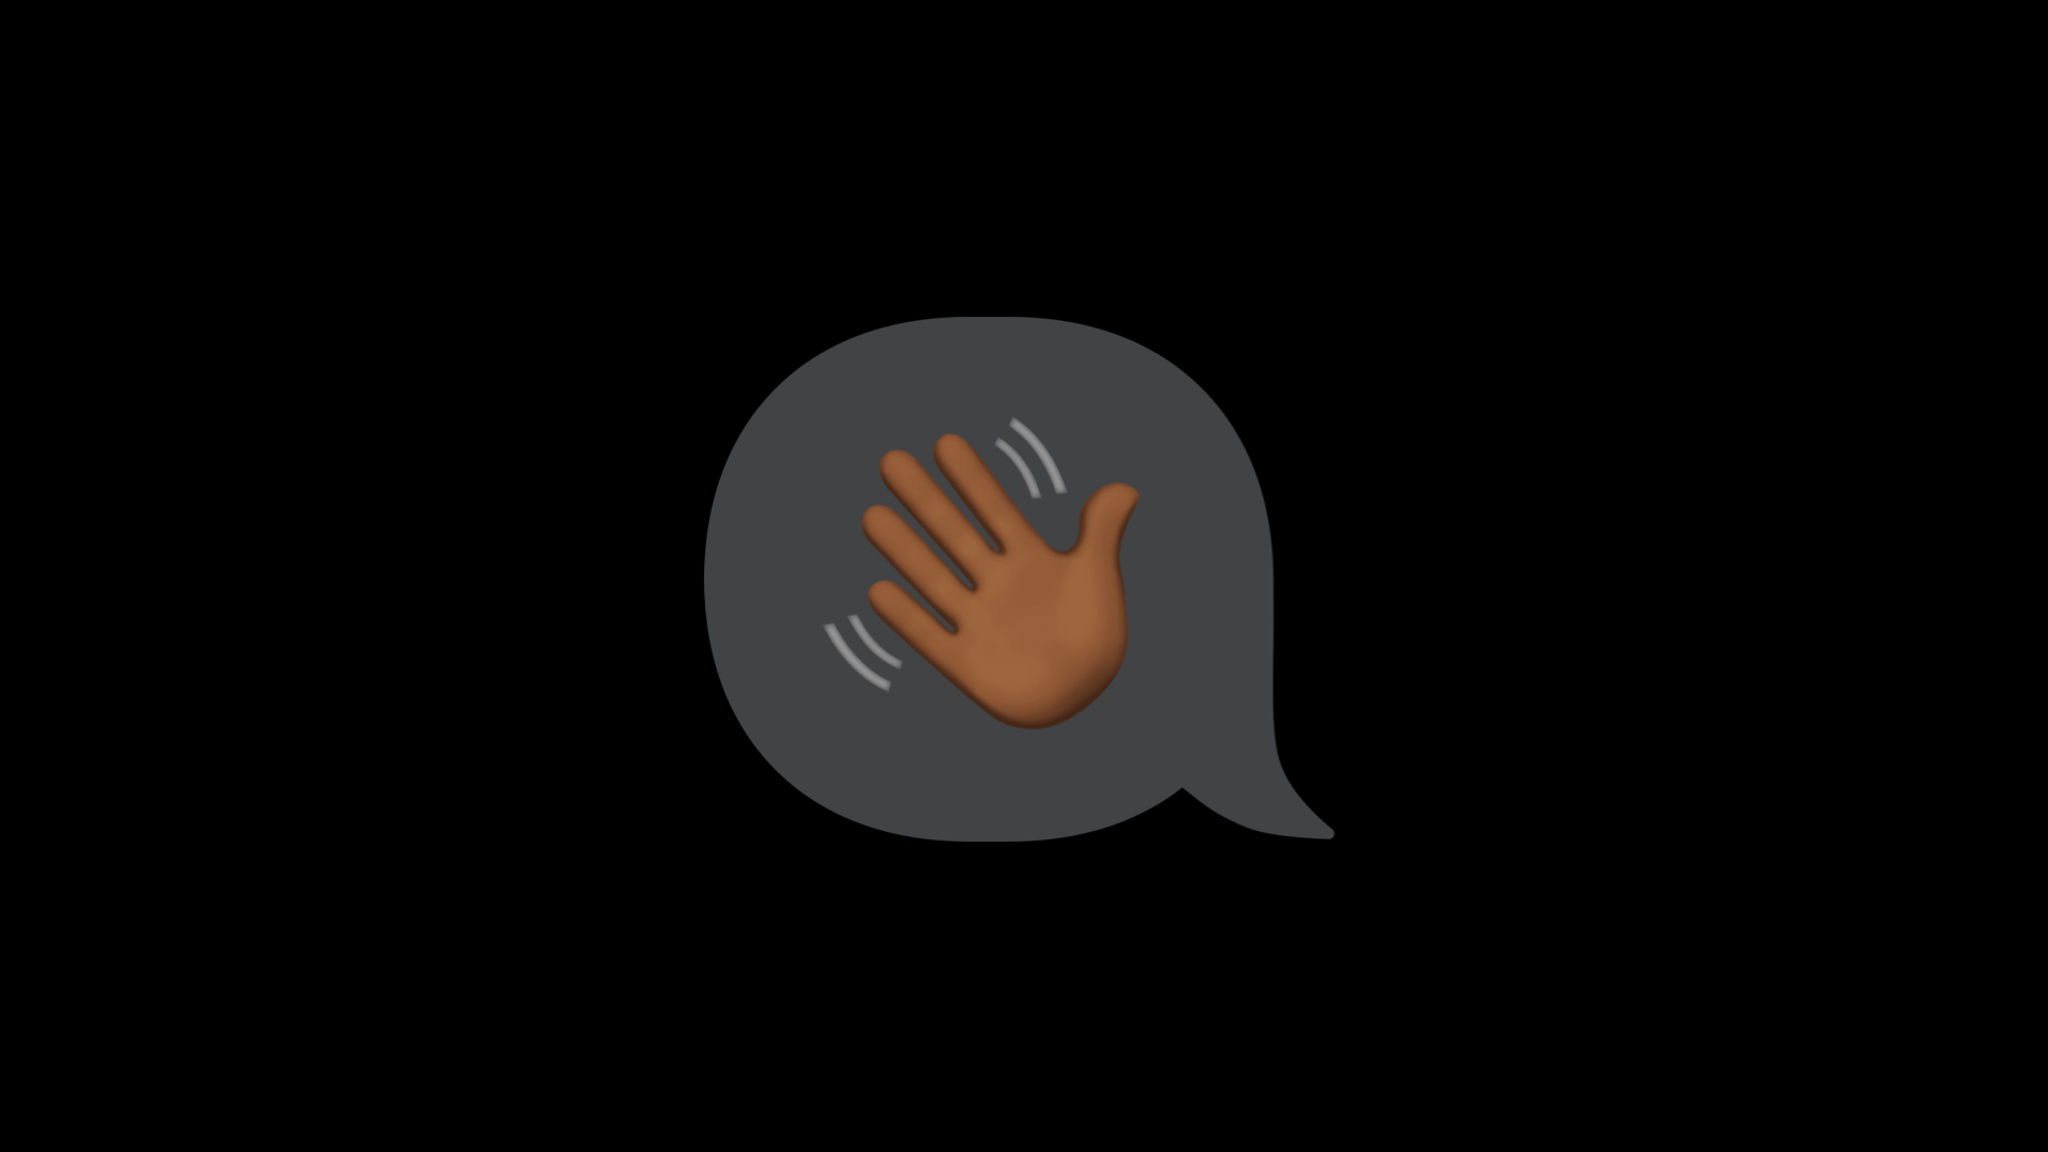 A waving hand emoji inside of a speech bubble